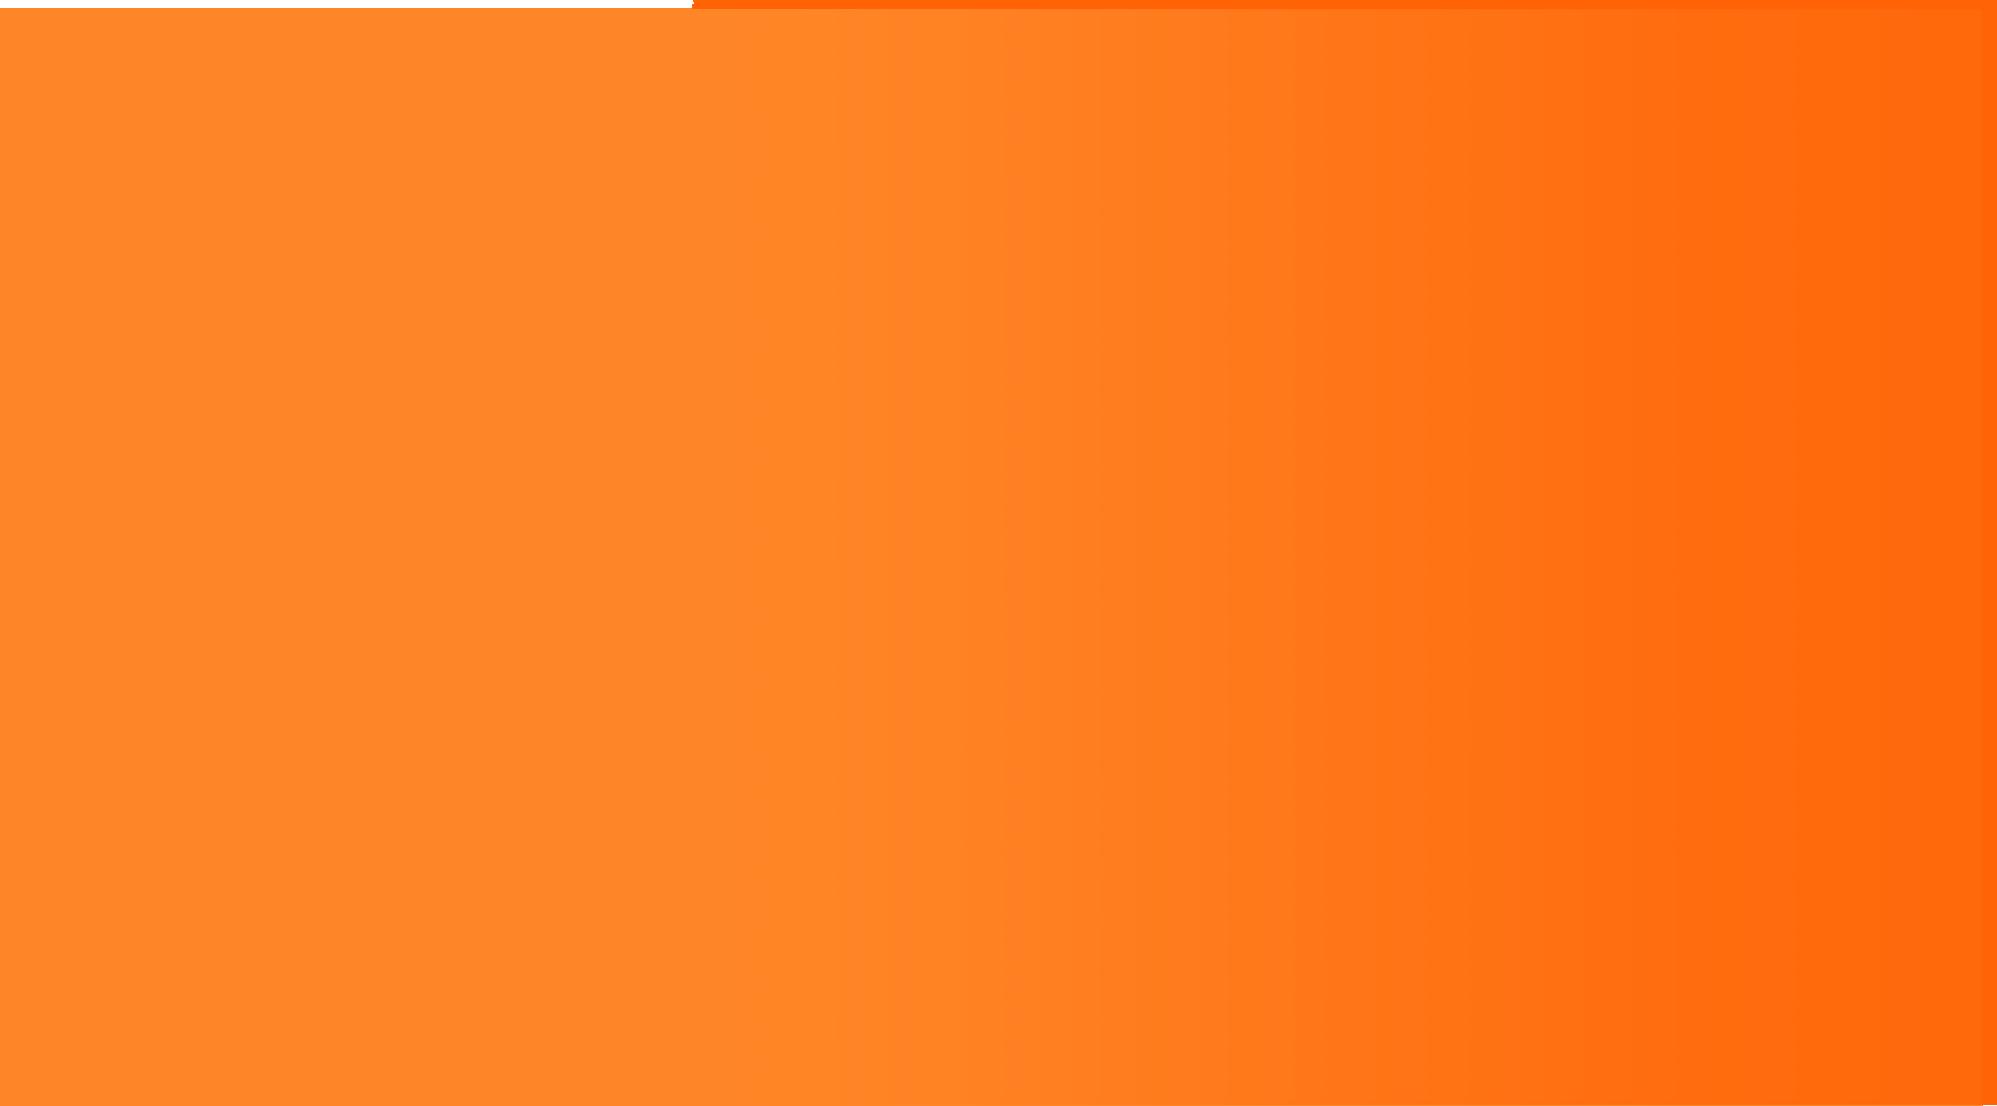 naranja fondo